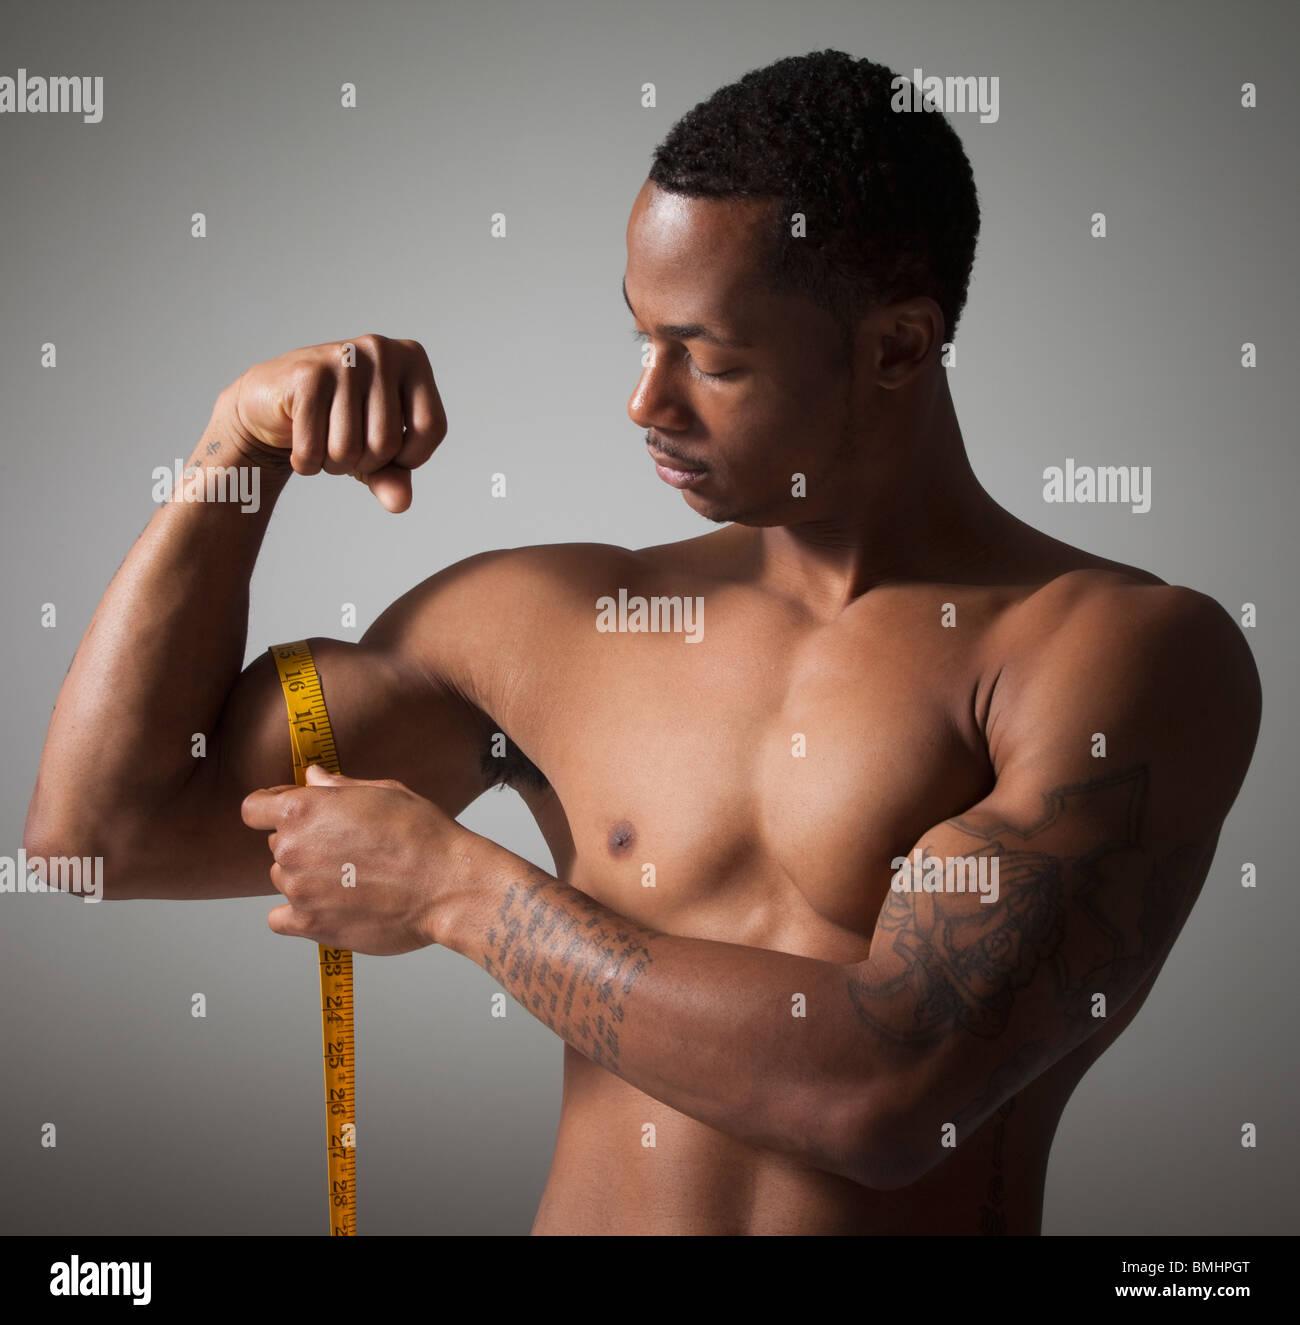 Man measuring his triceps - Stock Image